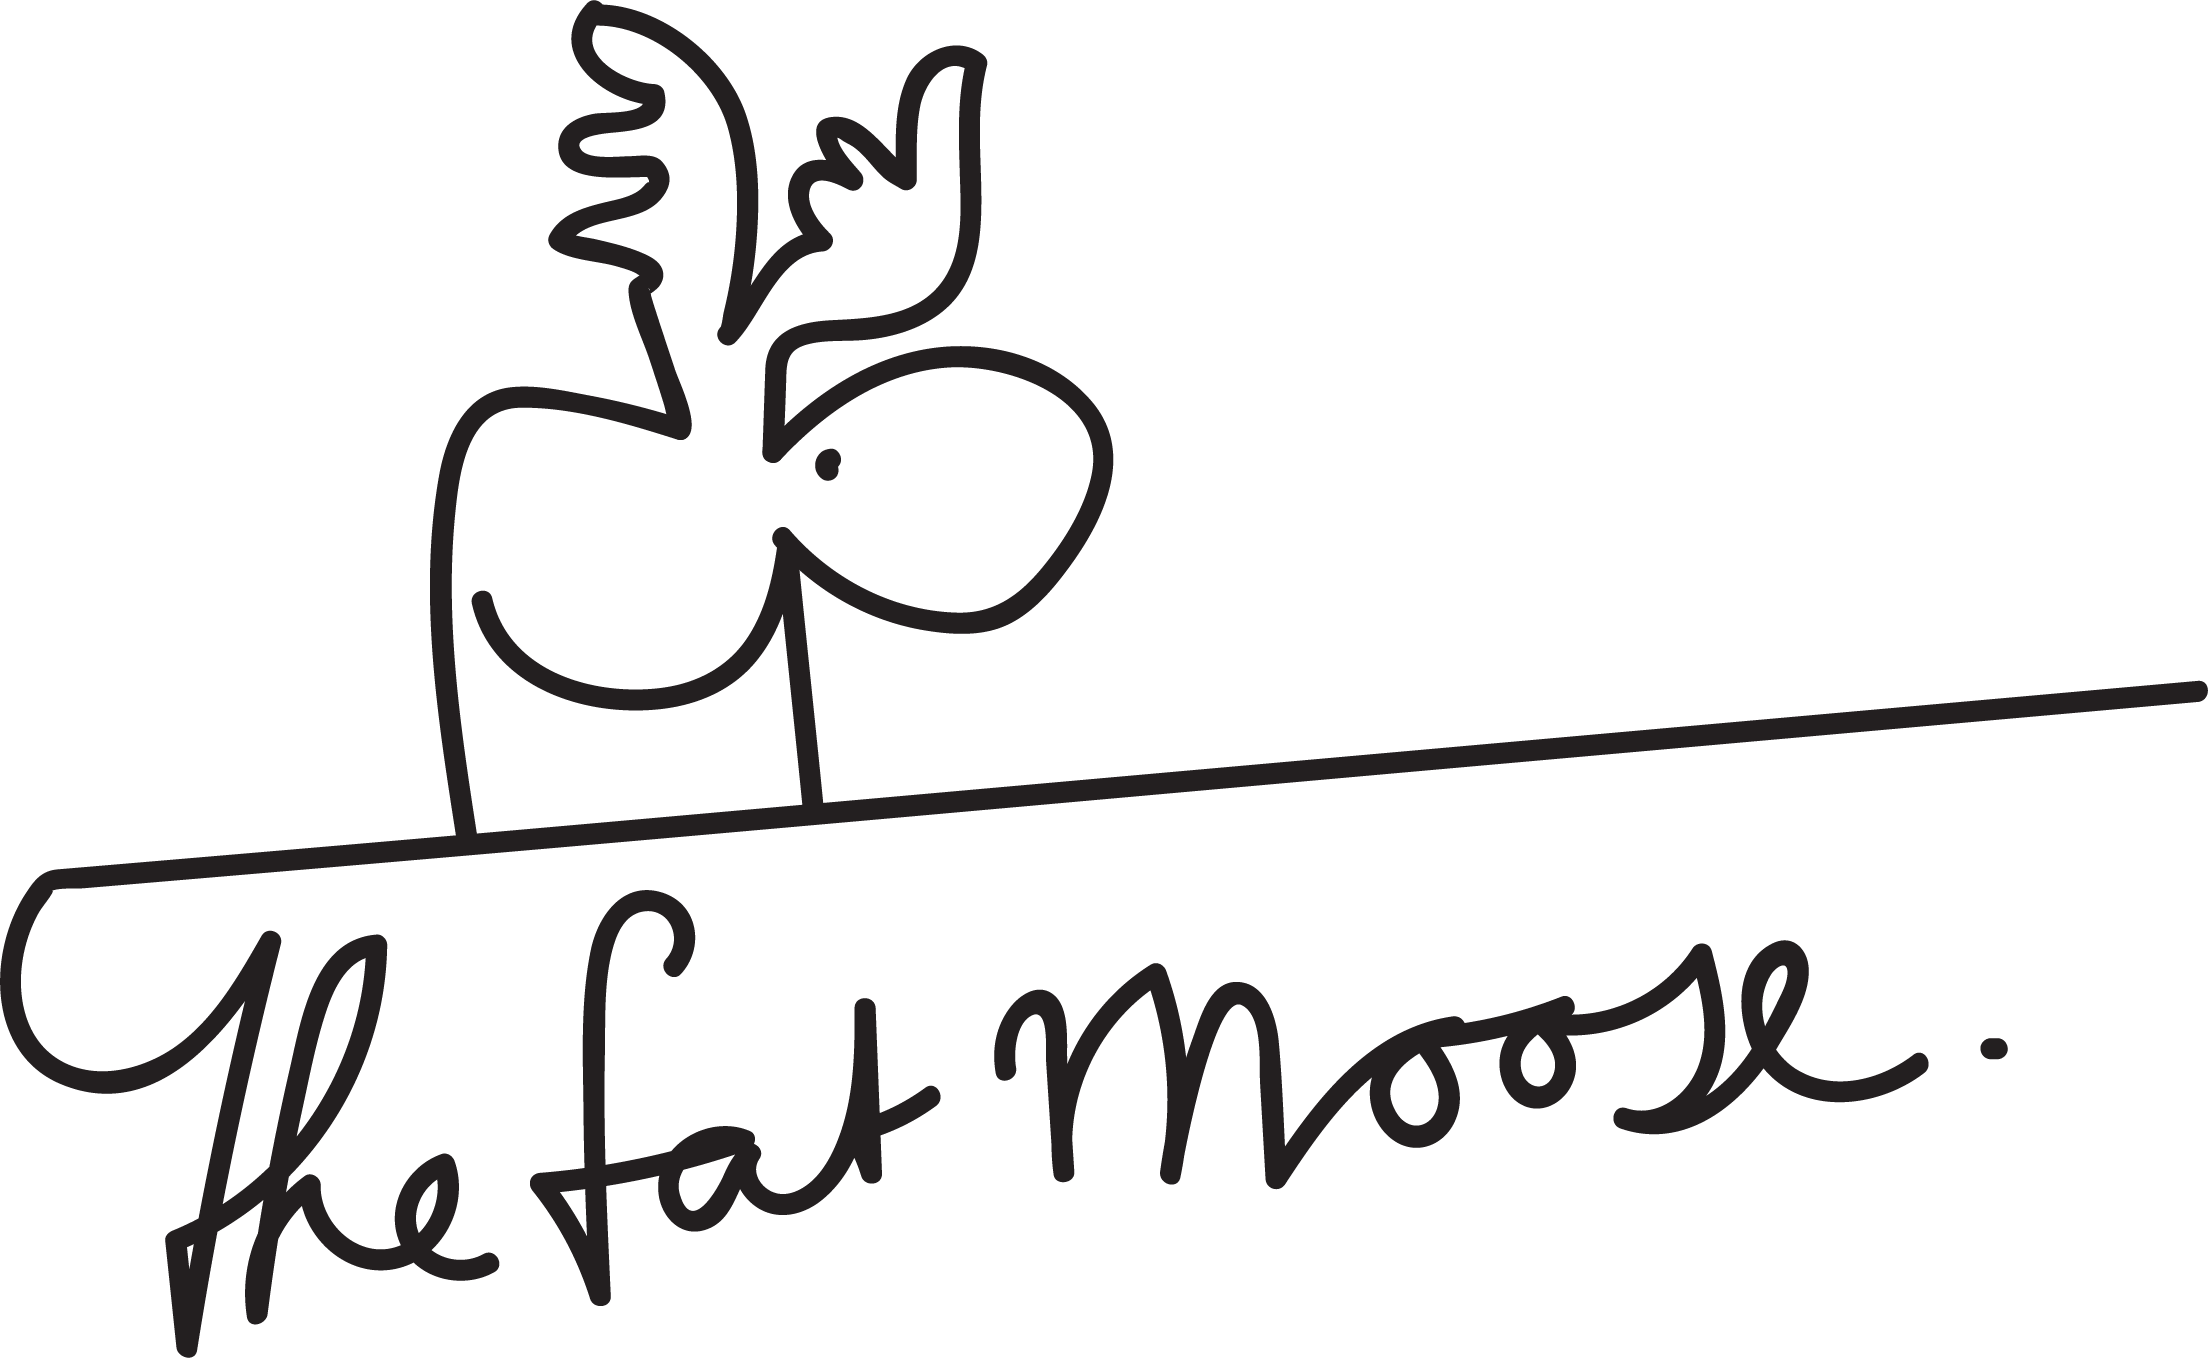 The Fat Moose